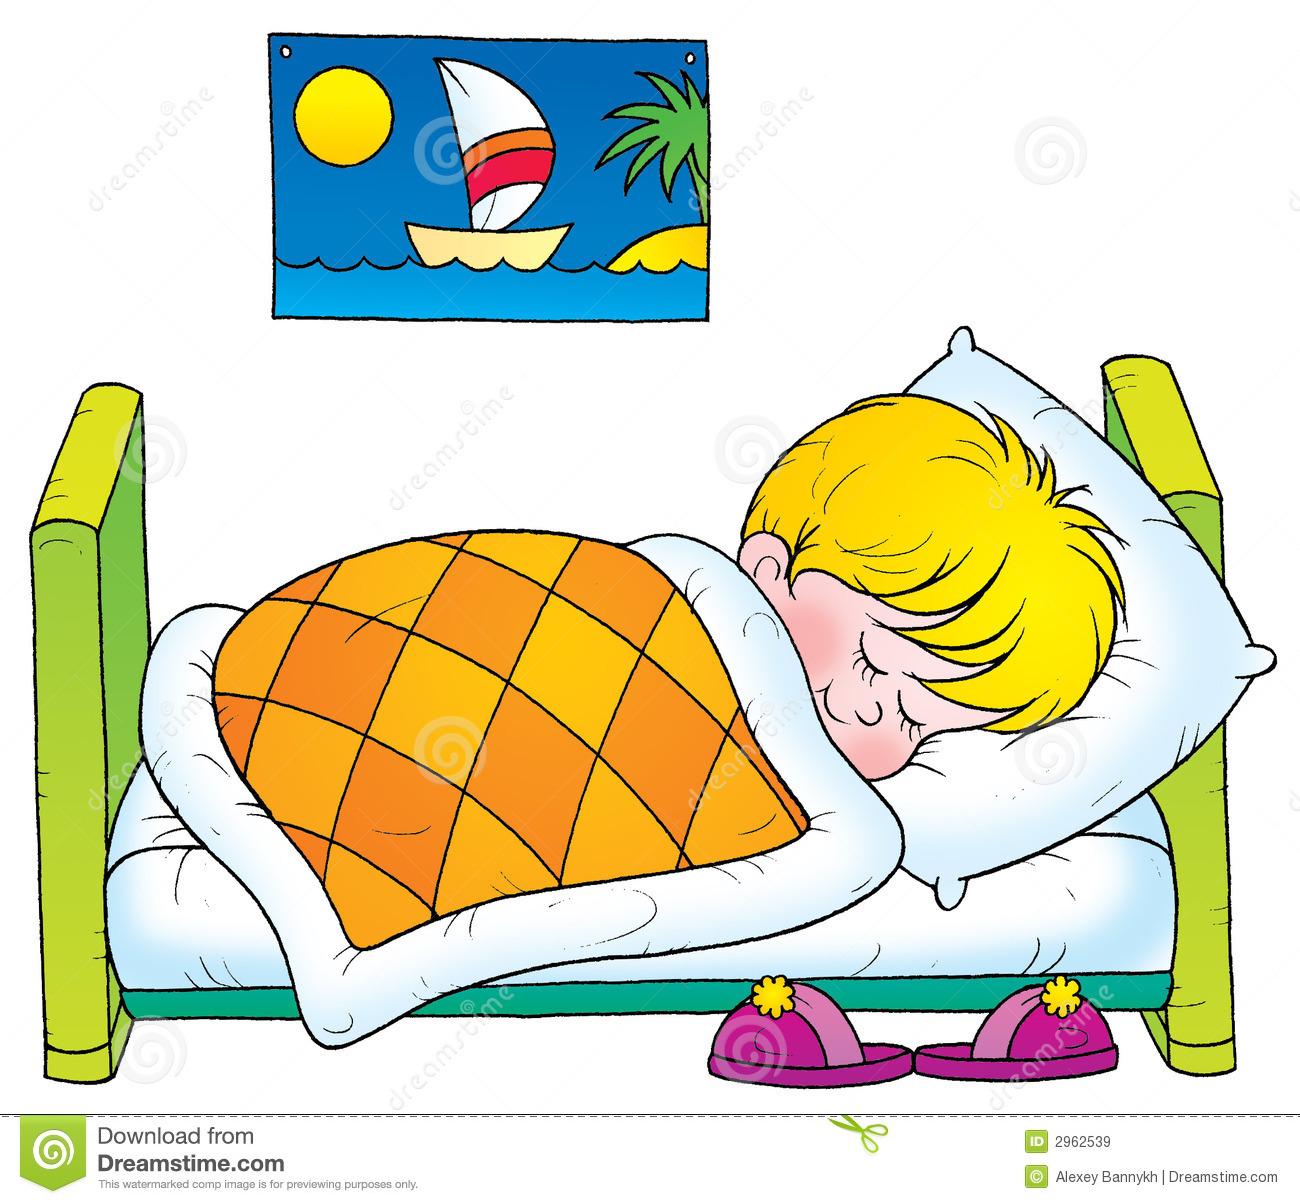 Asleep clipart #6